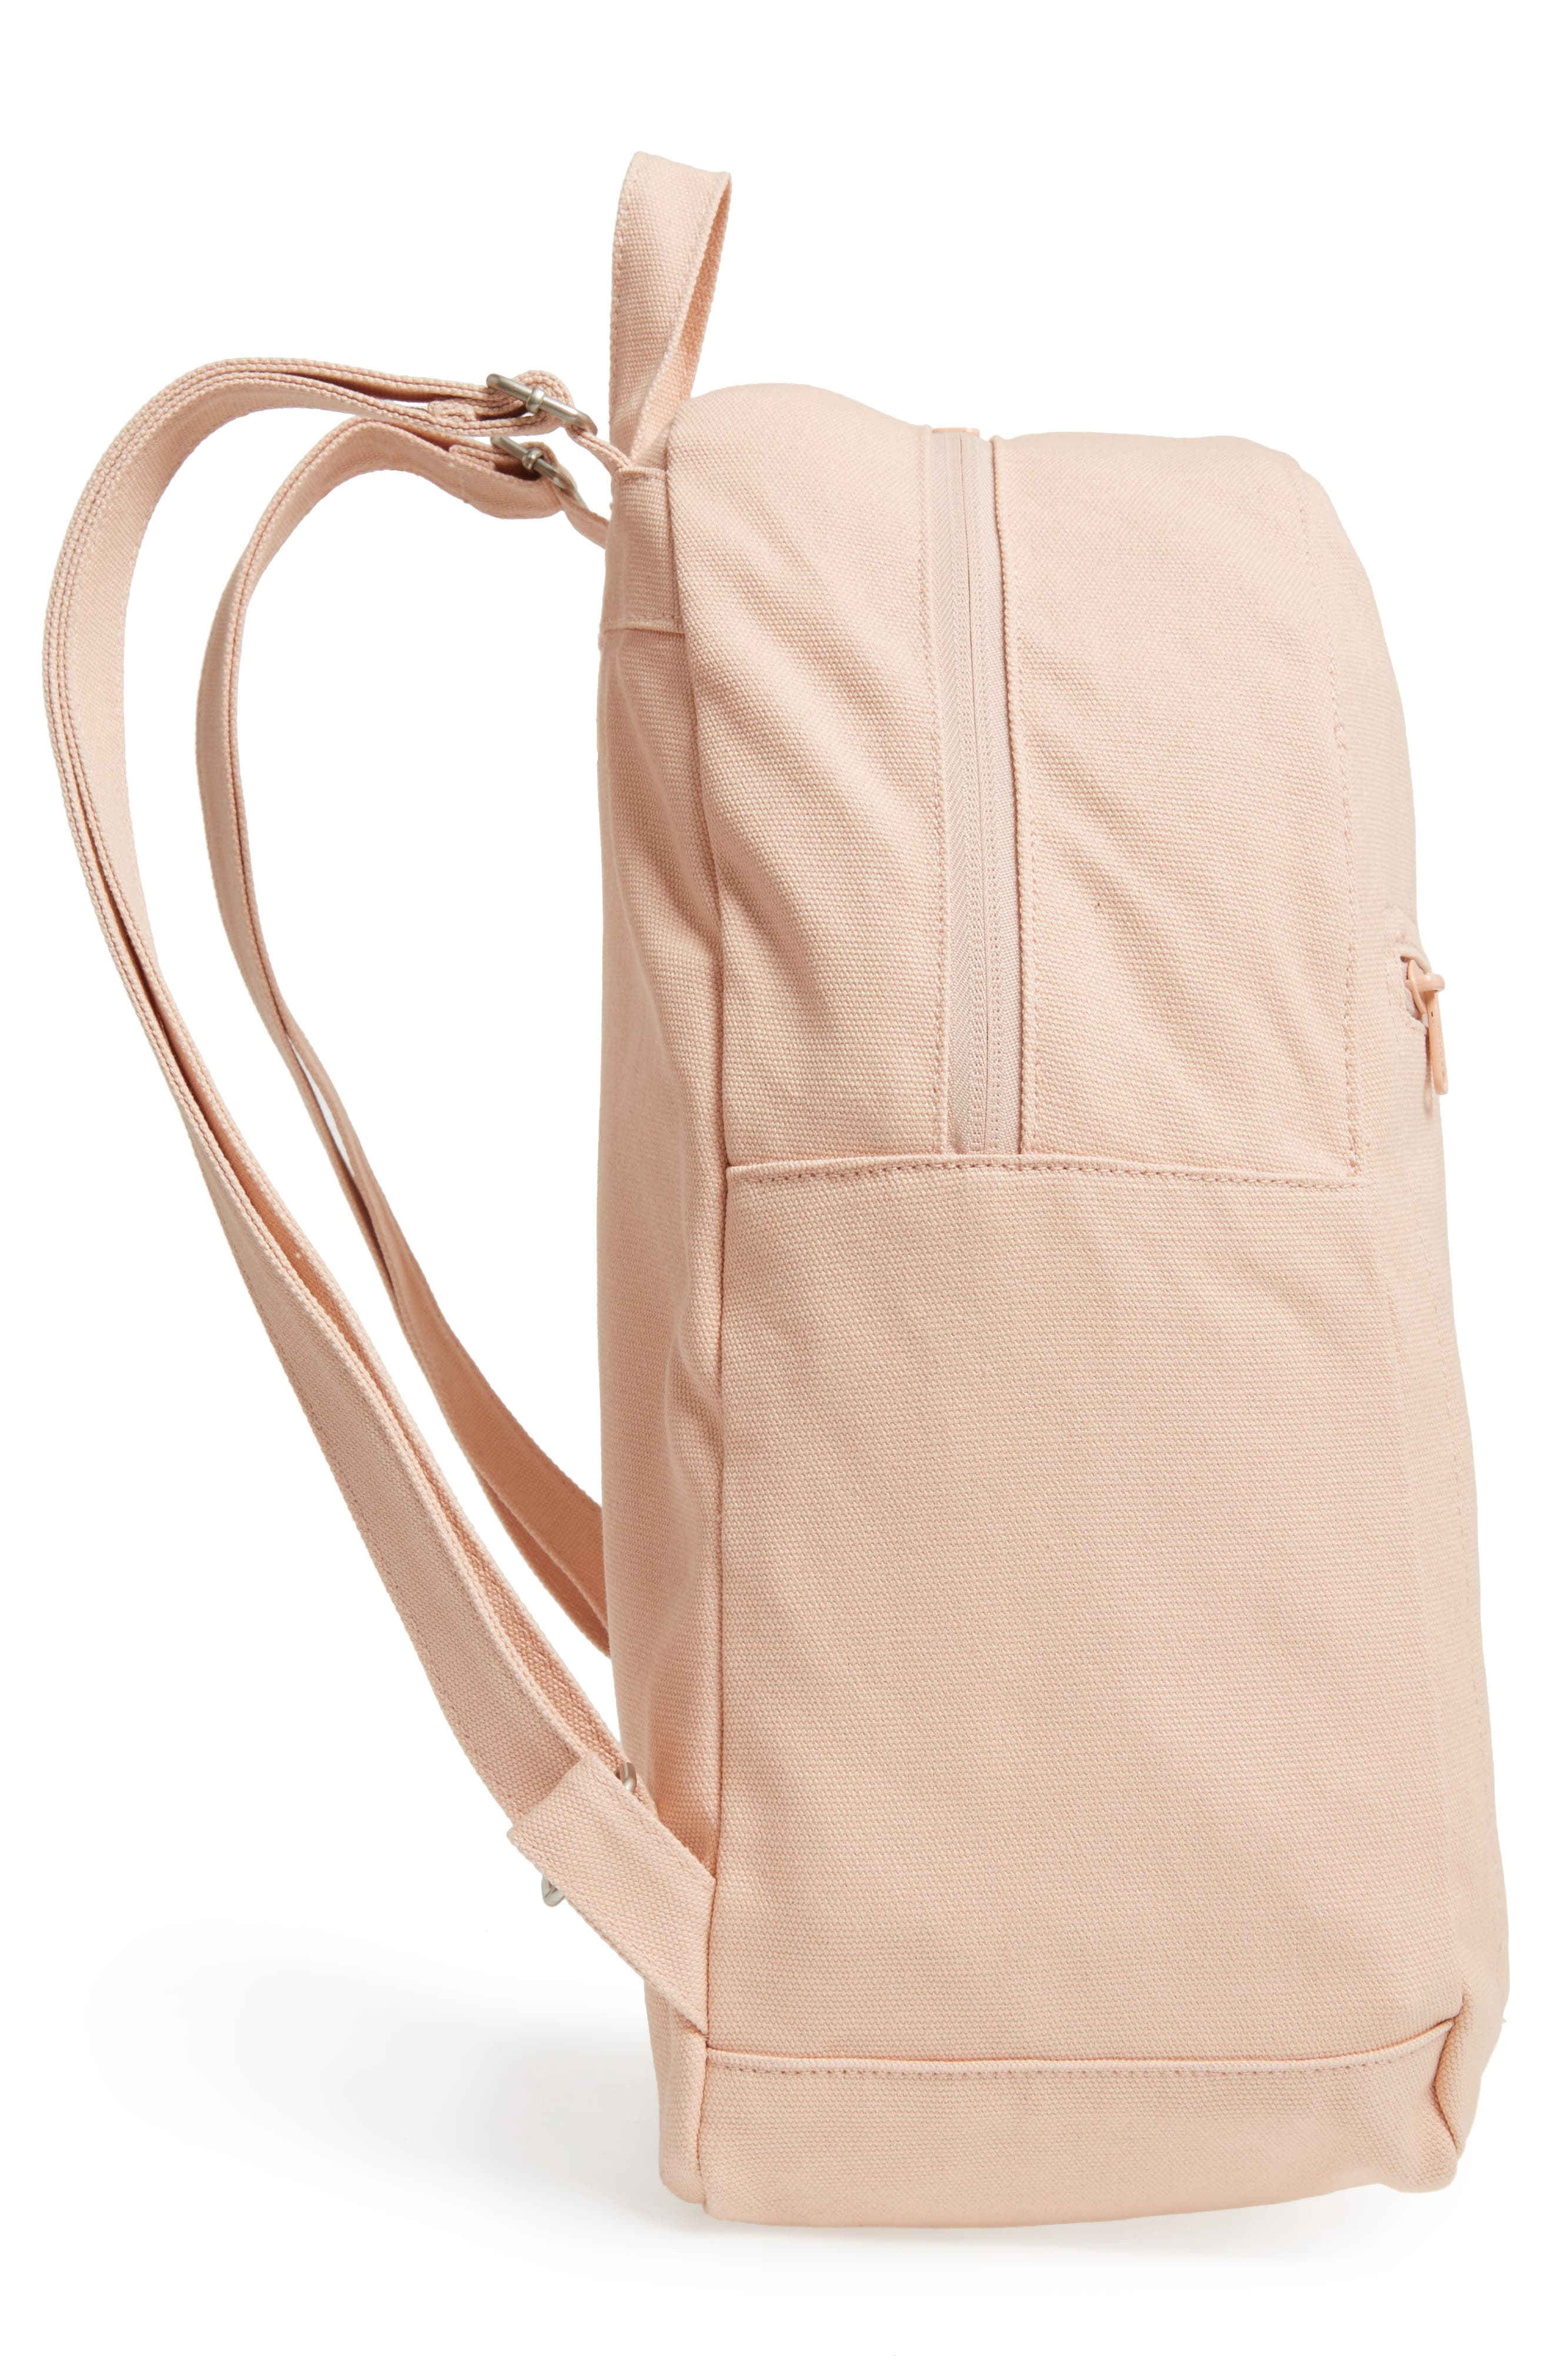 Canvas Backpack,                             Alternate thumbnail 5, color,                             Shell